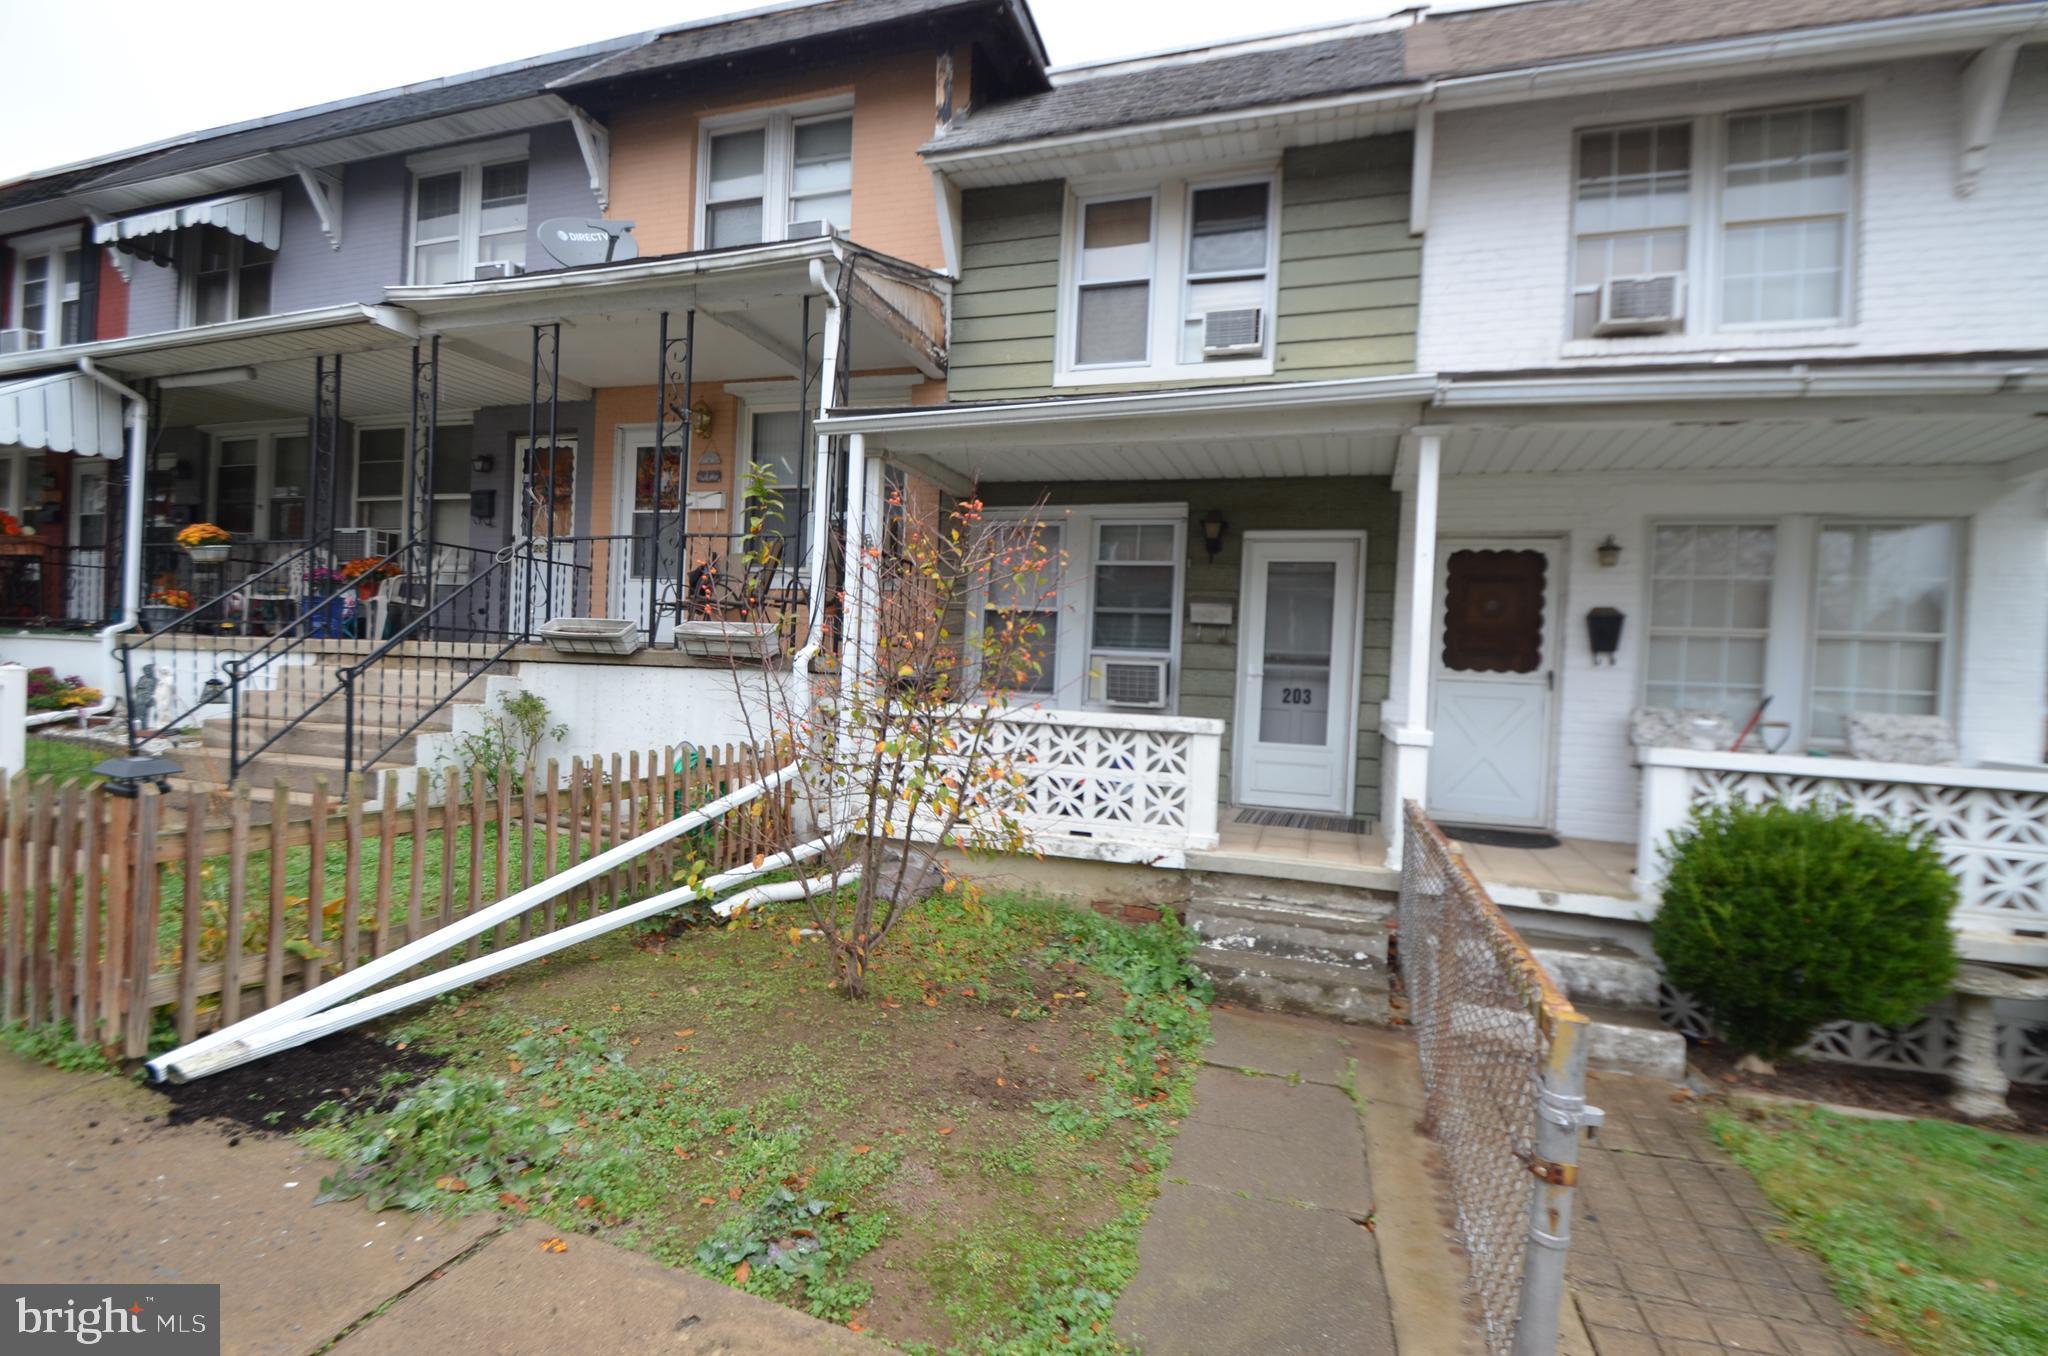 203 CLEARFIELD STREET, BETHLEHEM, PA 18017